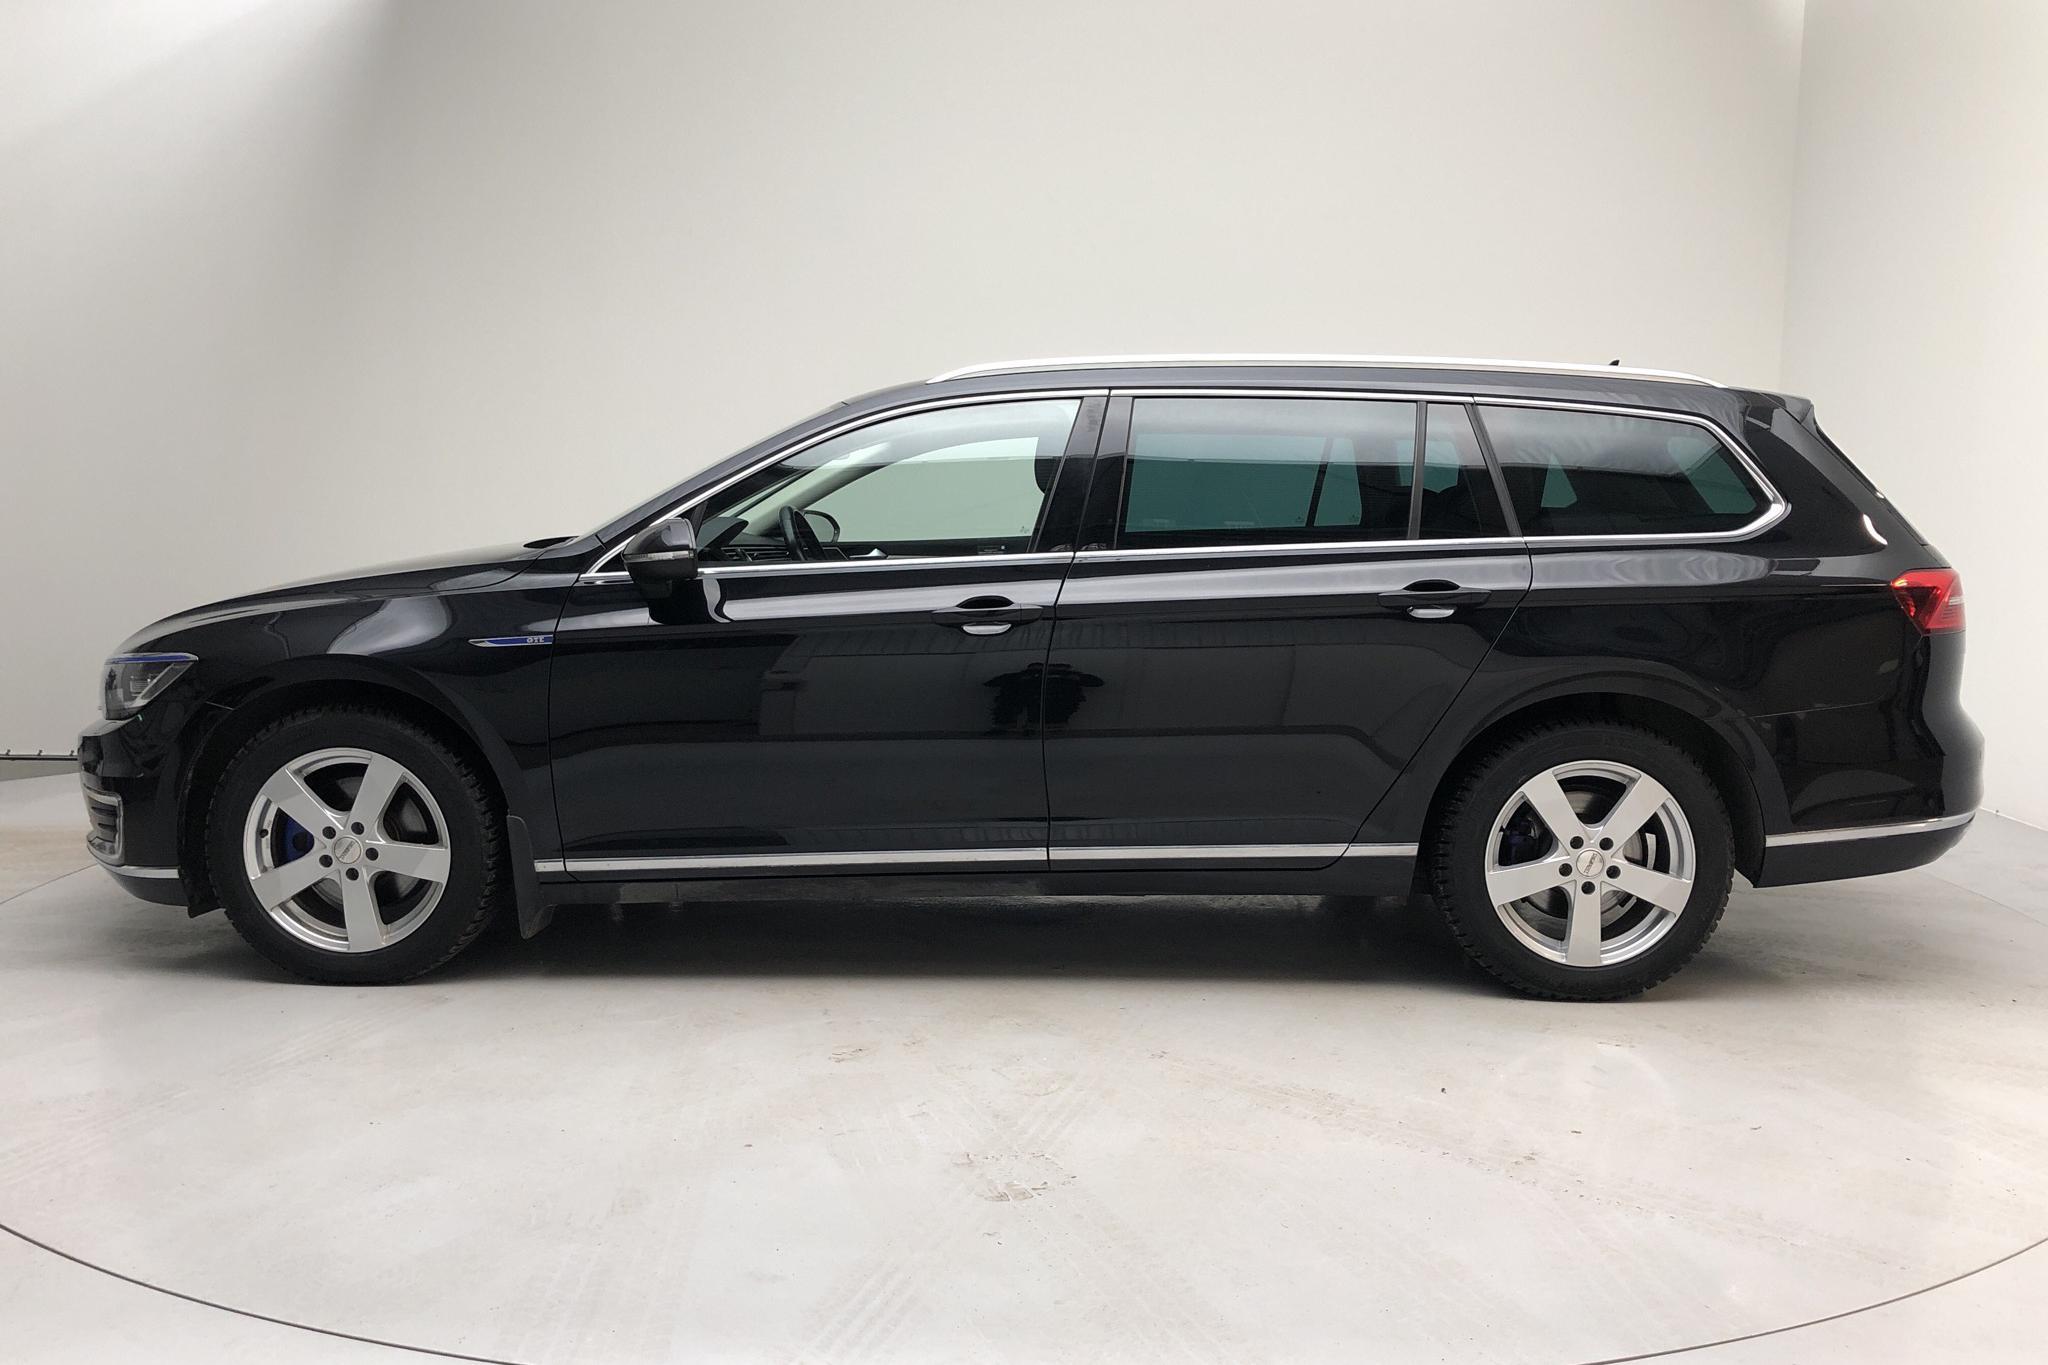 VW Passat 1.4 Plug-in-Hybrid Sportscombi (218hk) - 76 280 km - Automatic - black - 2016